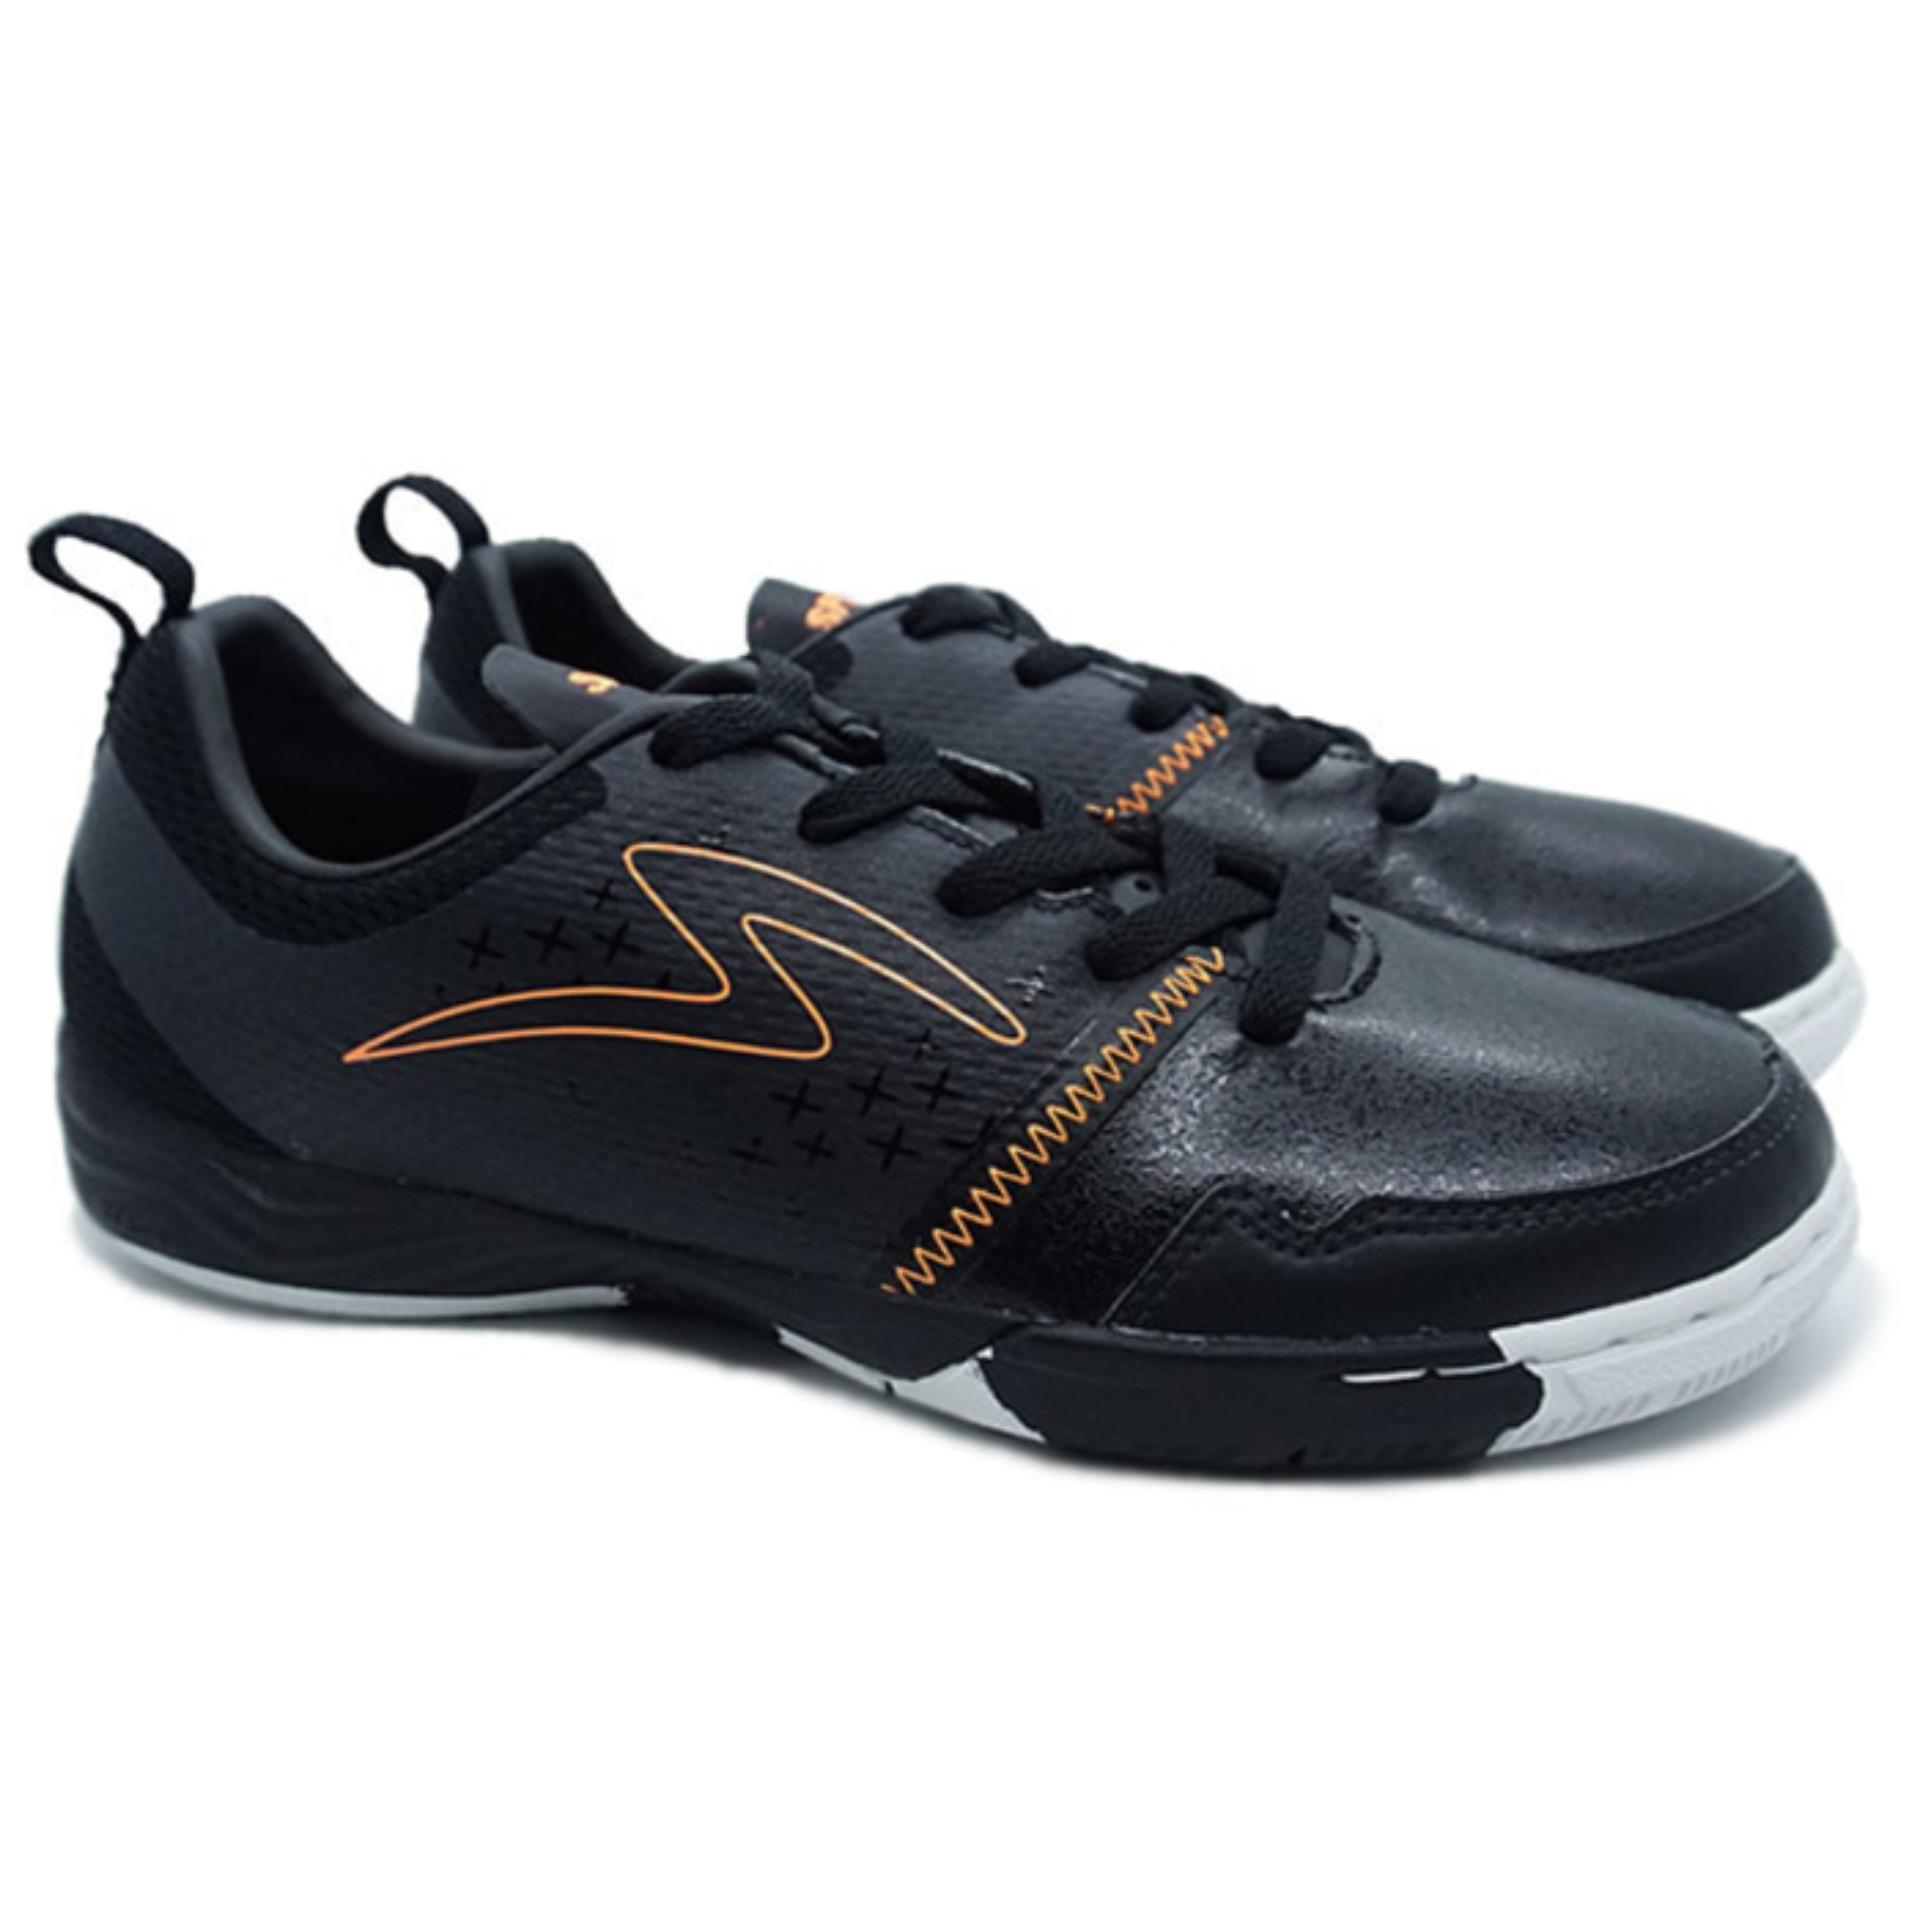 Specs Metasala Punisher Black Orange White | Sepatu Futsal